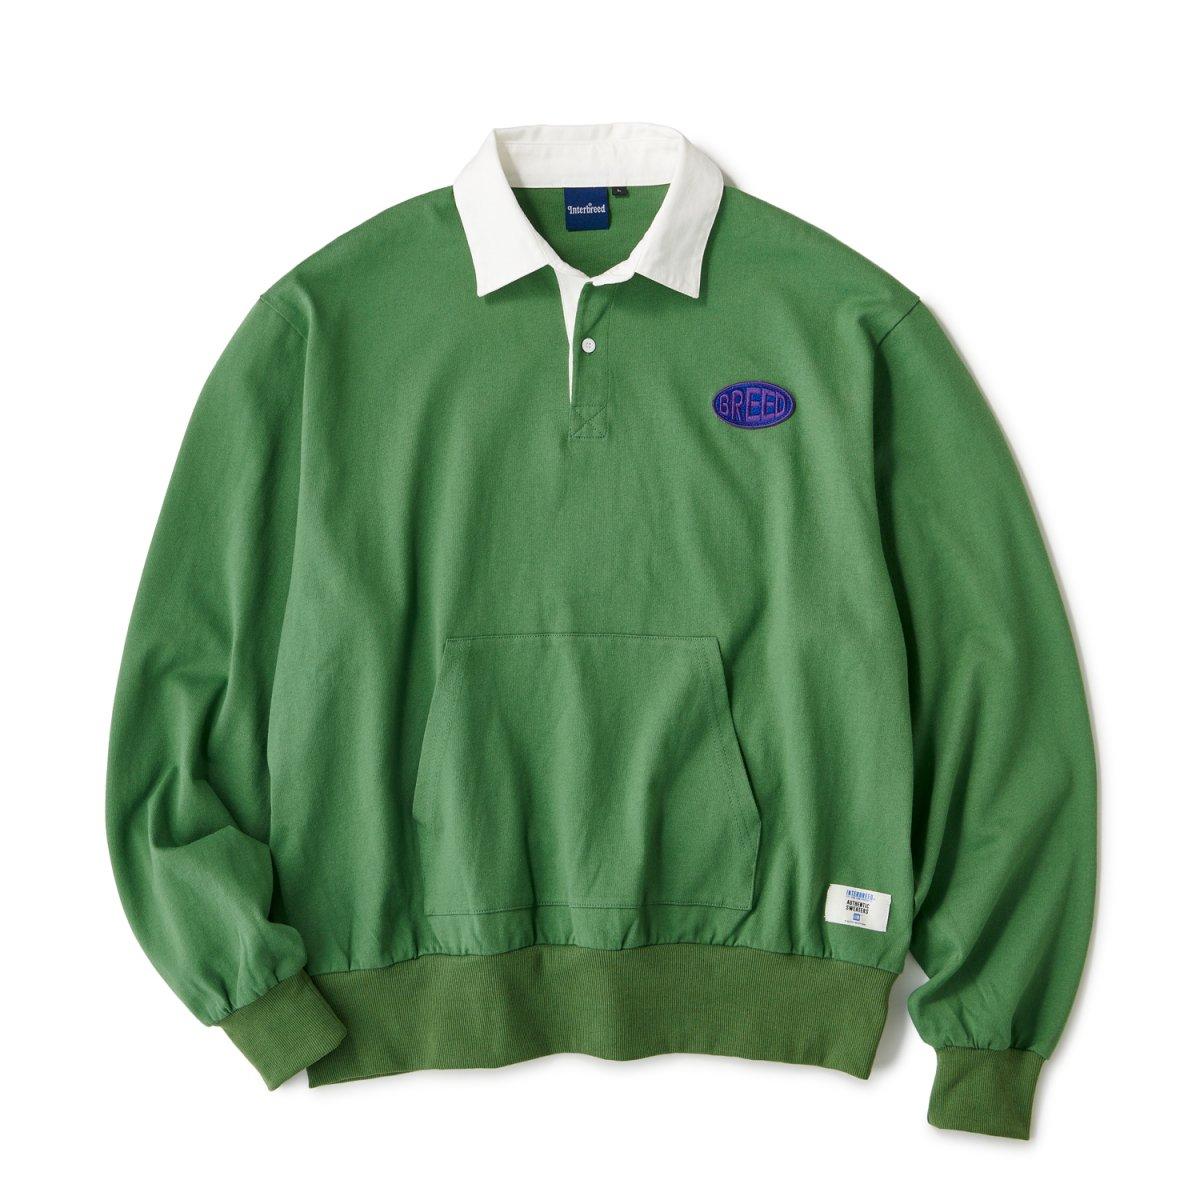 Shove-it Shirt / Green